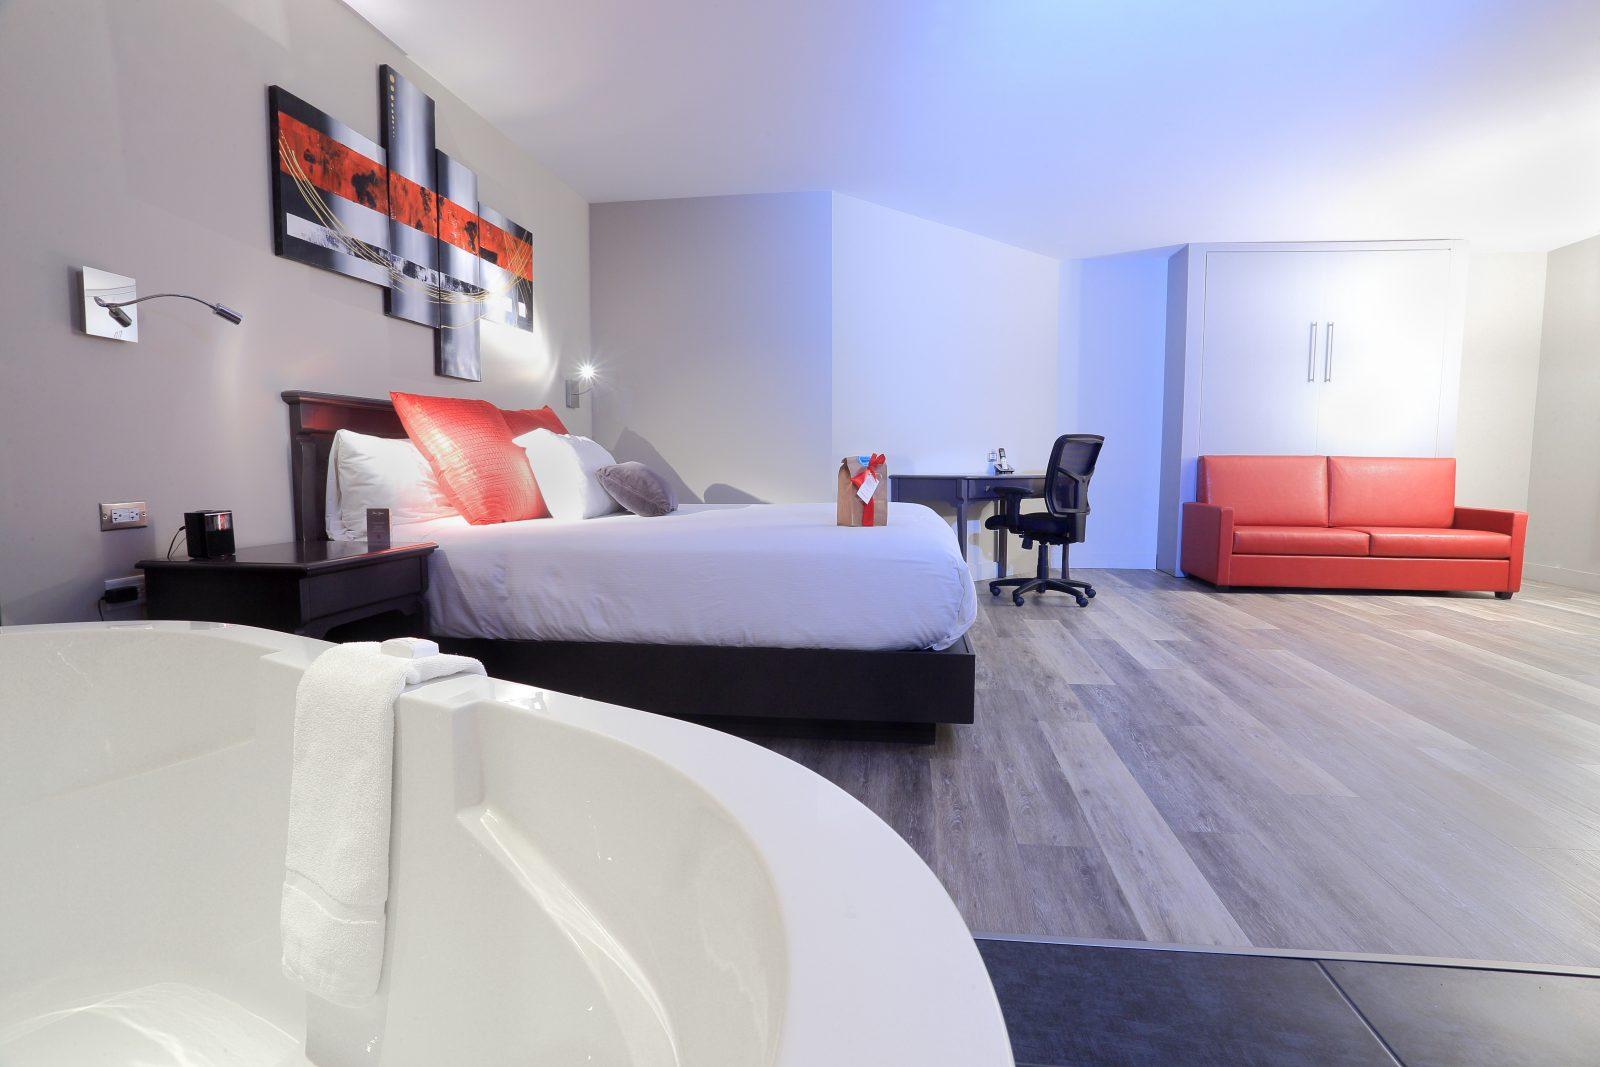 https://www.hoteluniversel.com/wp-content/uploads/2018/09/Suite-505-3-1600x1067.jpg